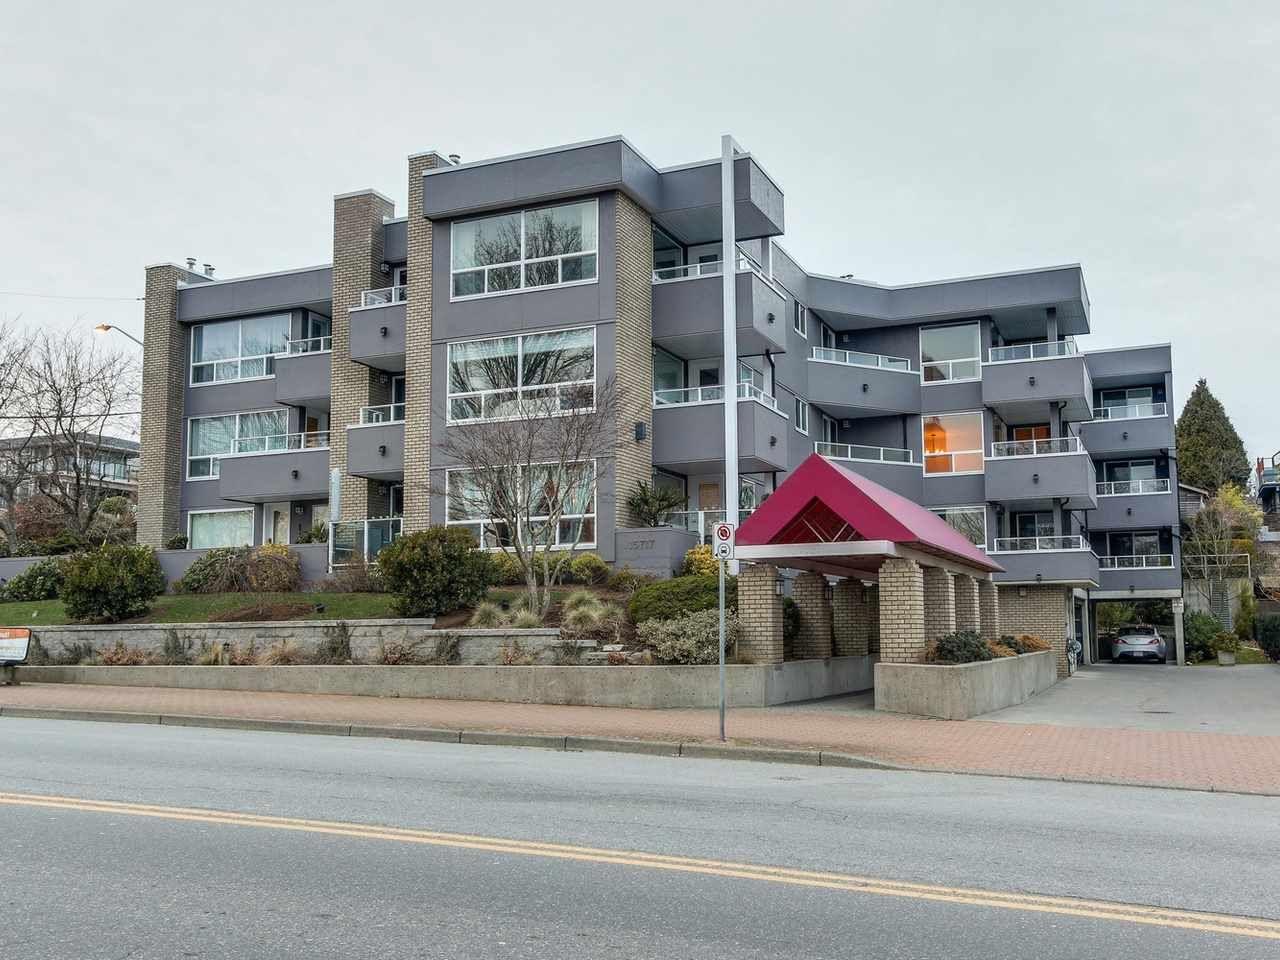 "Main Photo: 204 15717 MARINE Drive: White Rock Condo for sale in ""PACIFIC SANDS"" (South Surrey White Rock)  : MLS®# R2130824"